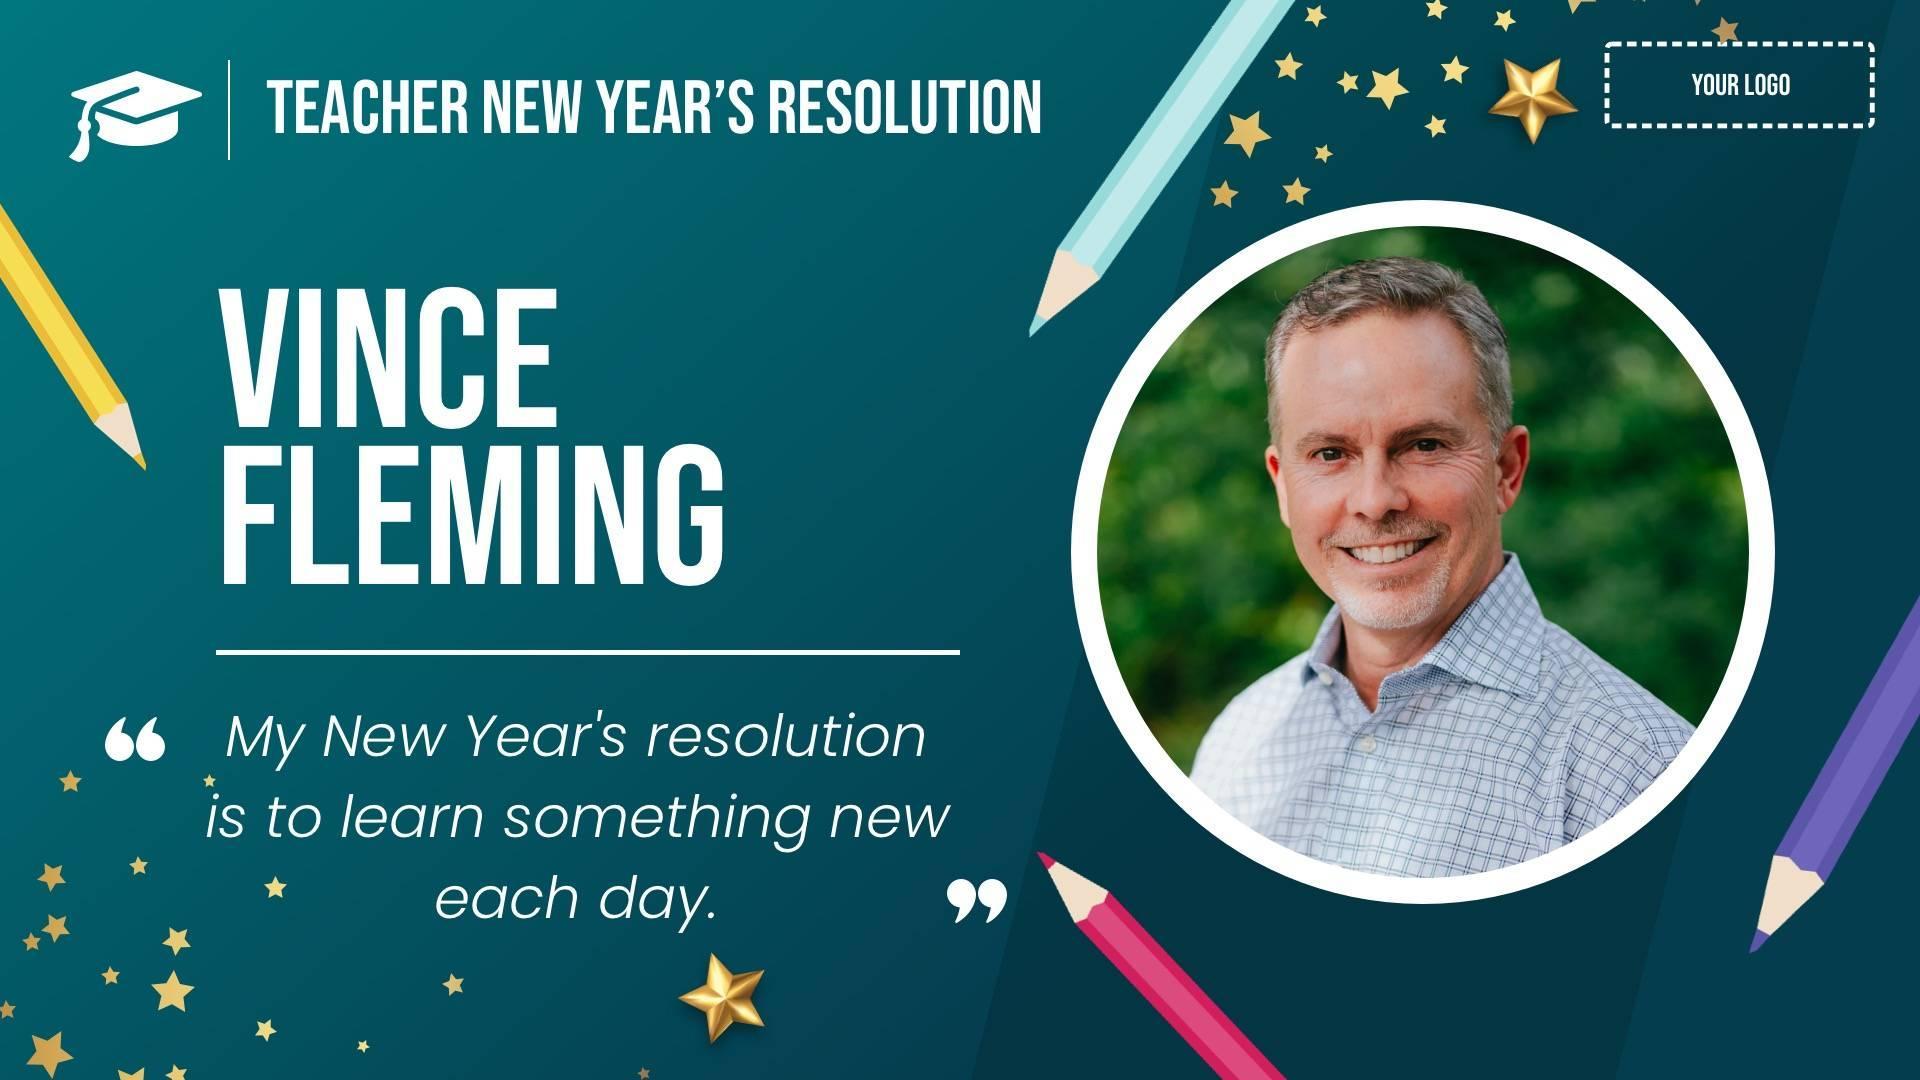 New Year's Teacher Resolution Digital Signage Template